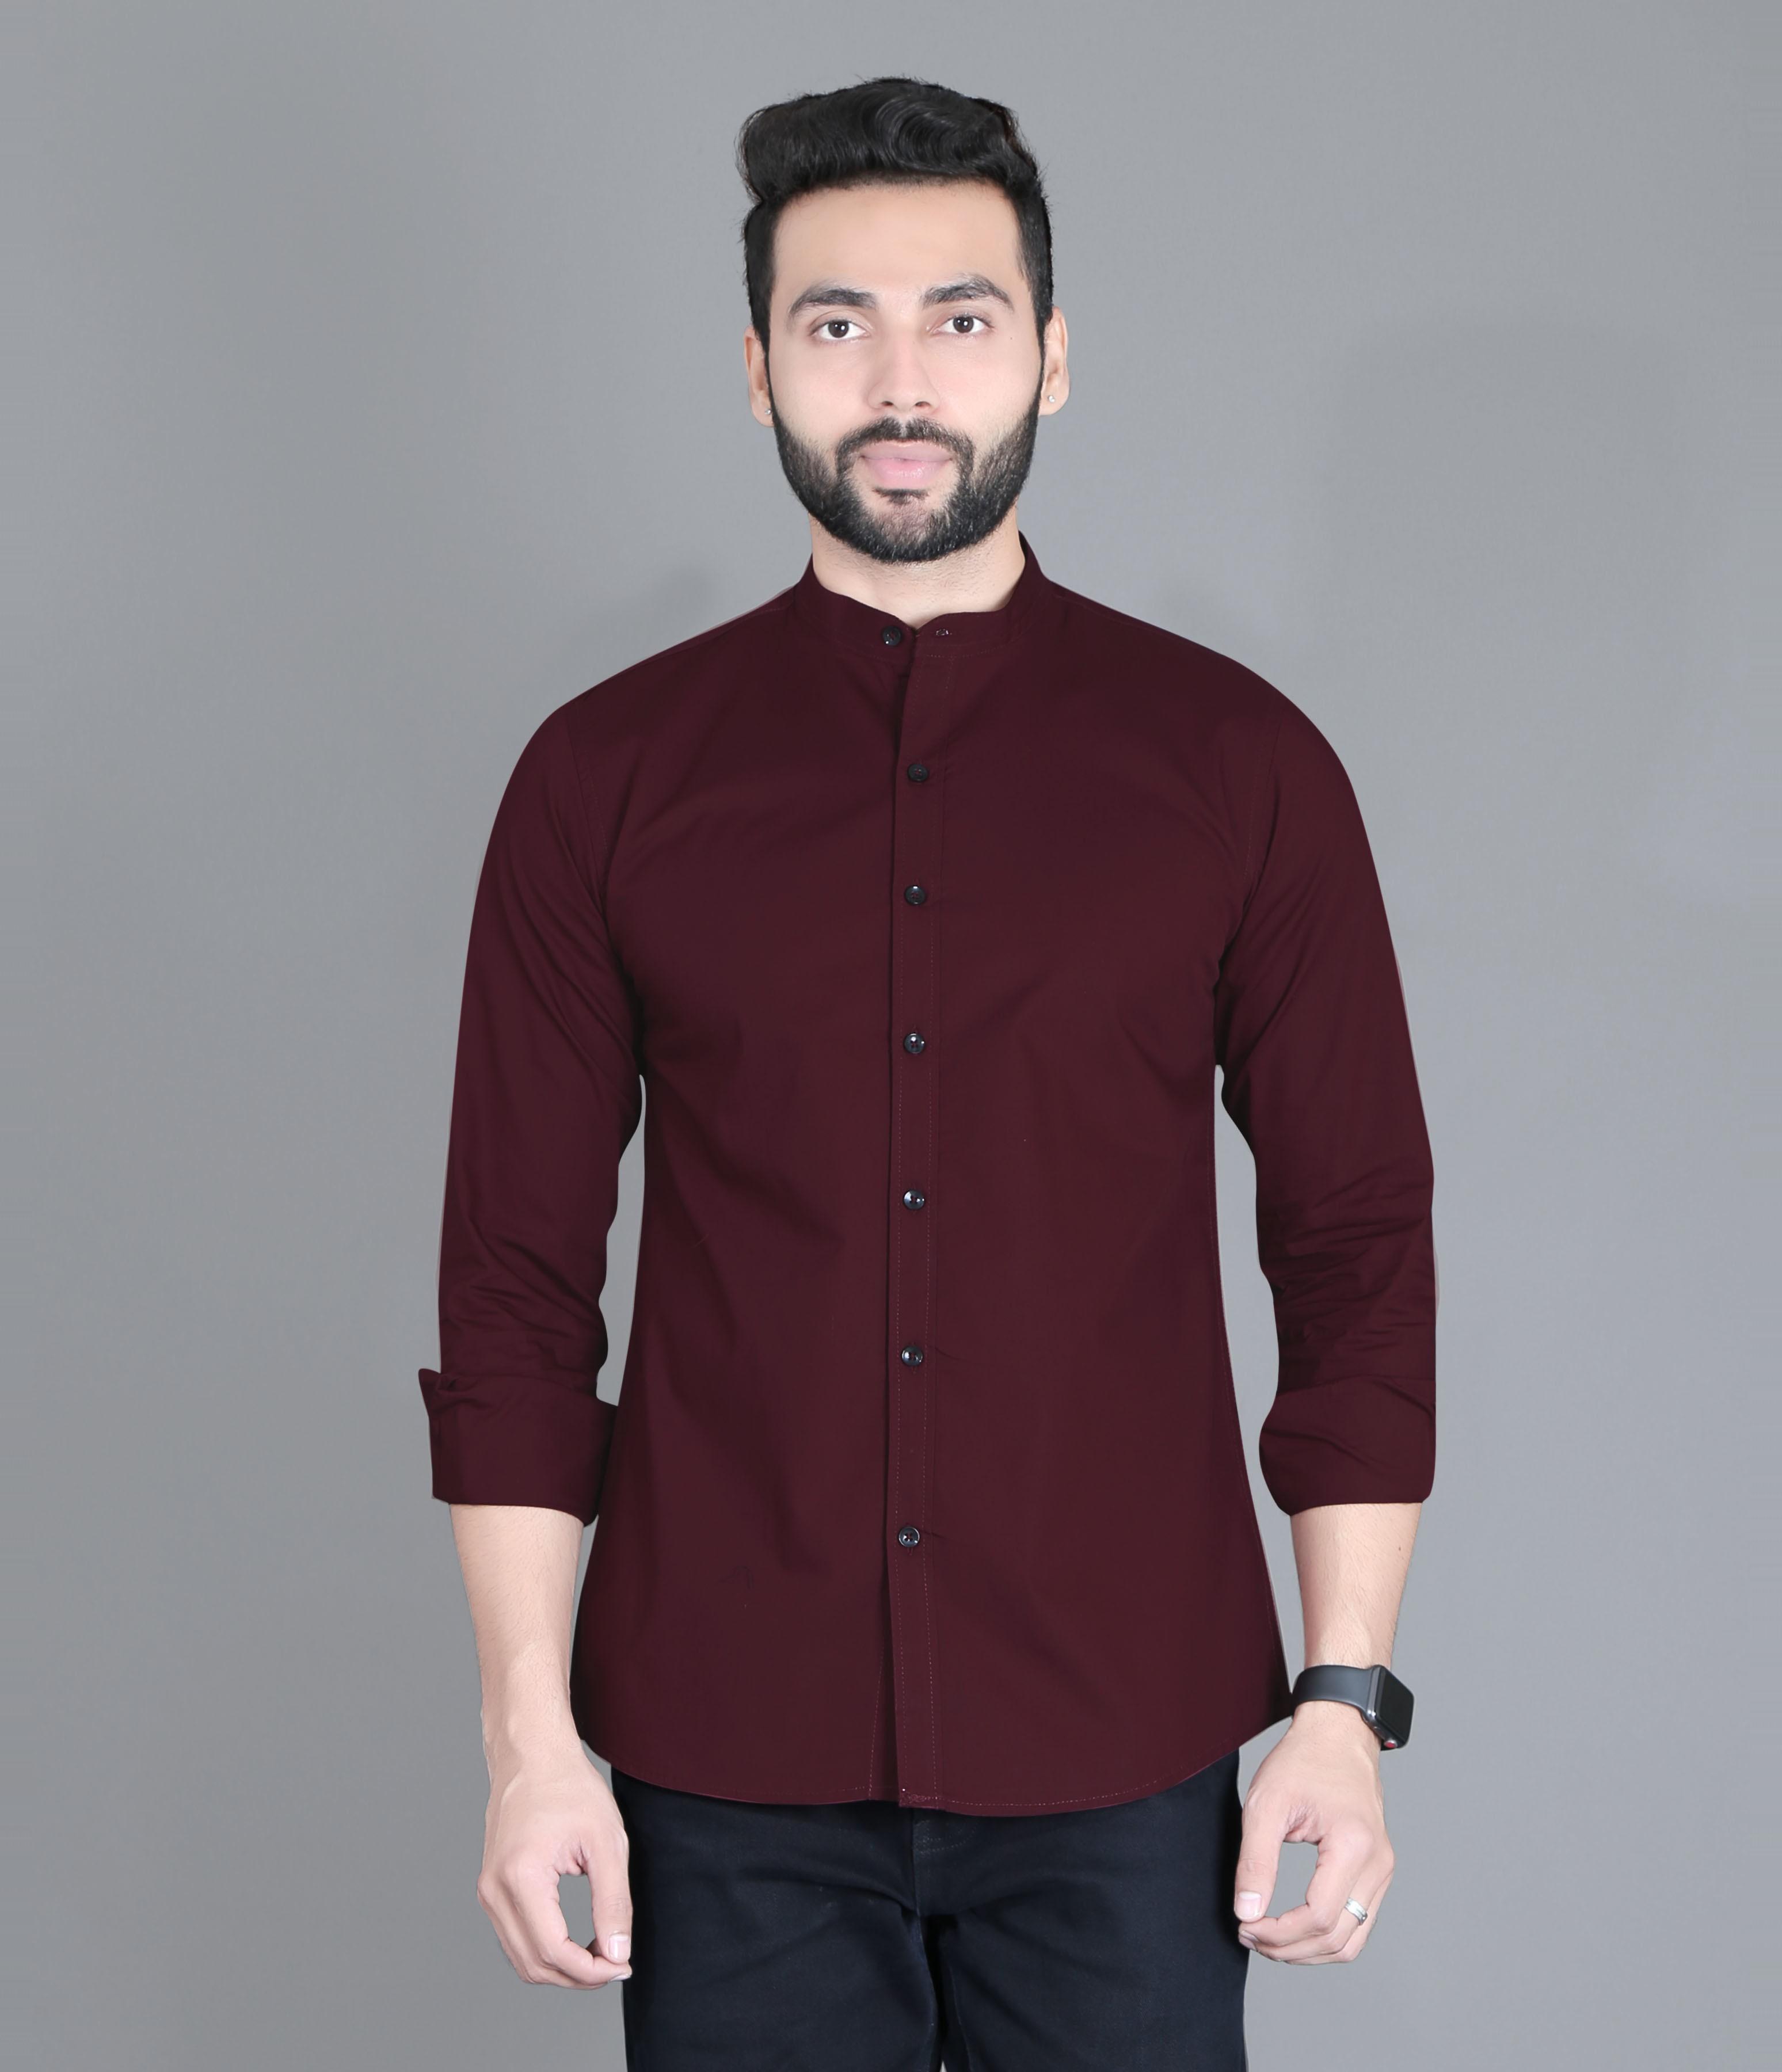 5th Anfold | FIFTH ANFOLD Casual Mandrin Collar full Sleev/Long Sleev Maroon Pure Cotton Plain Solid Men Shirt